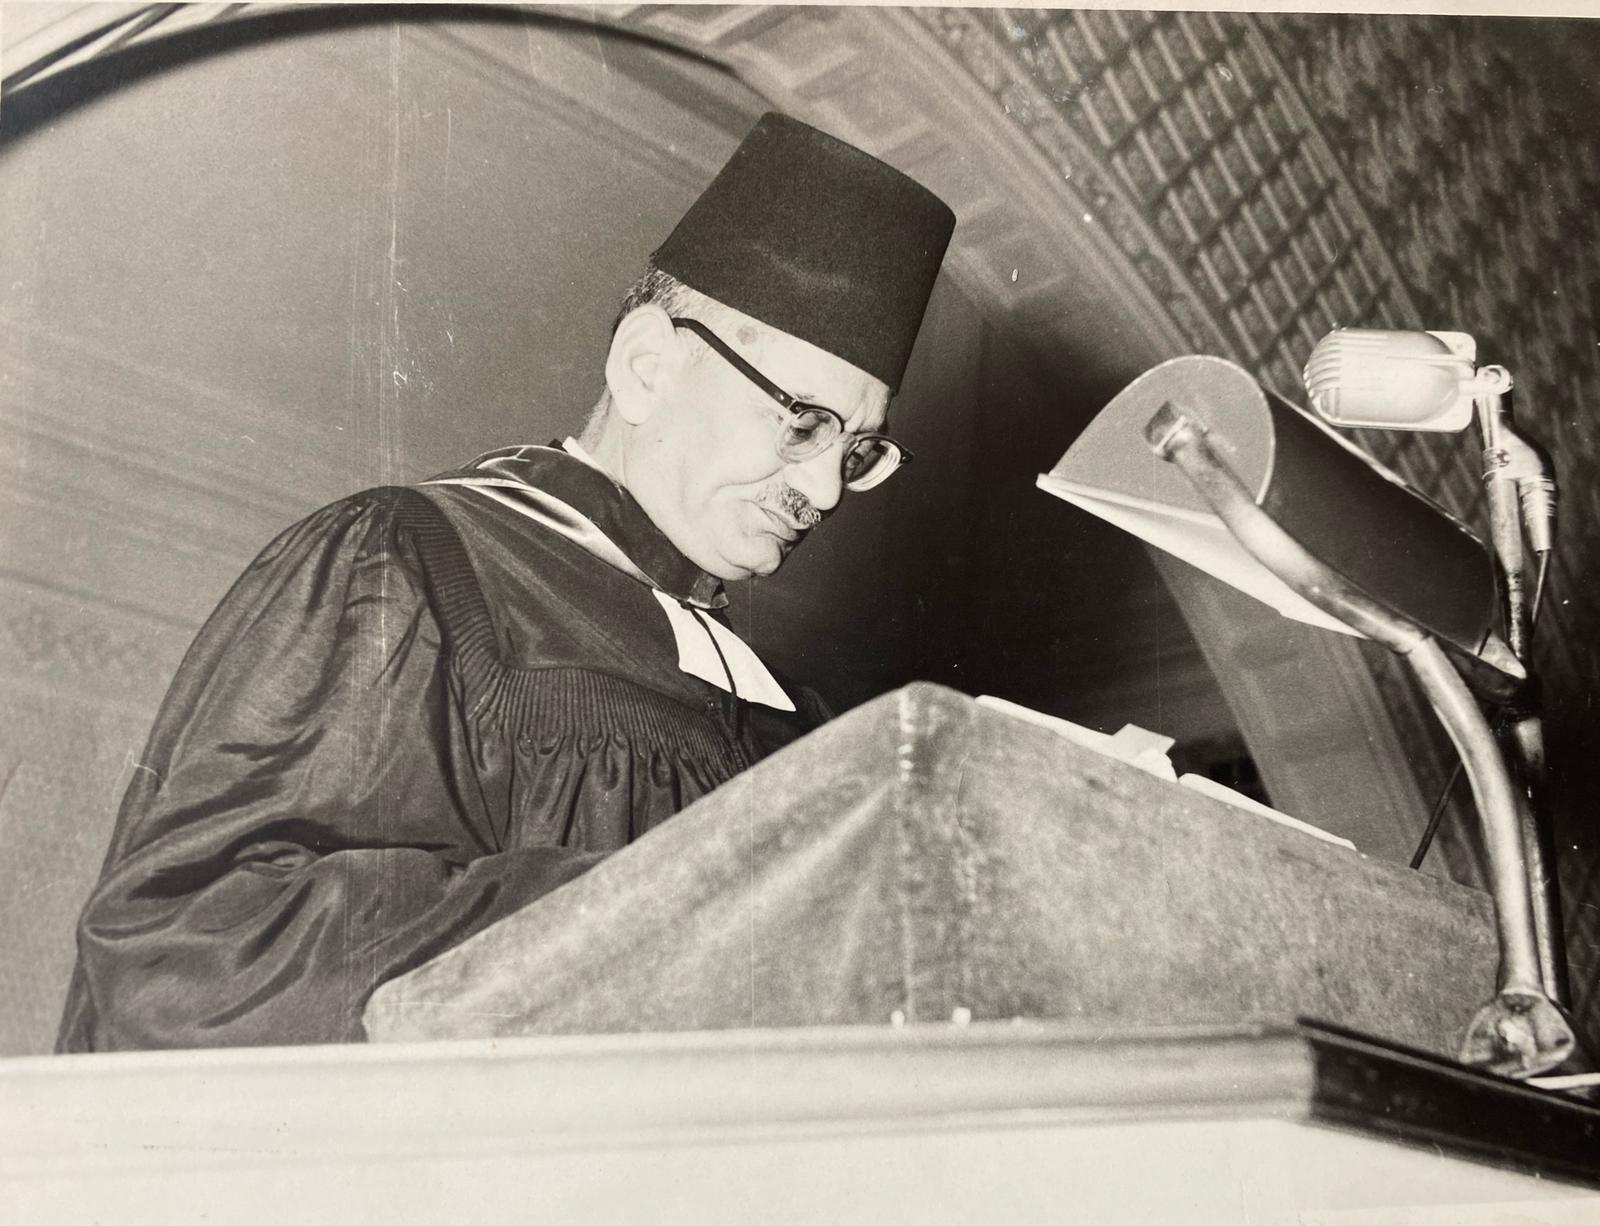 Pastor Iskandar Abskhiron